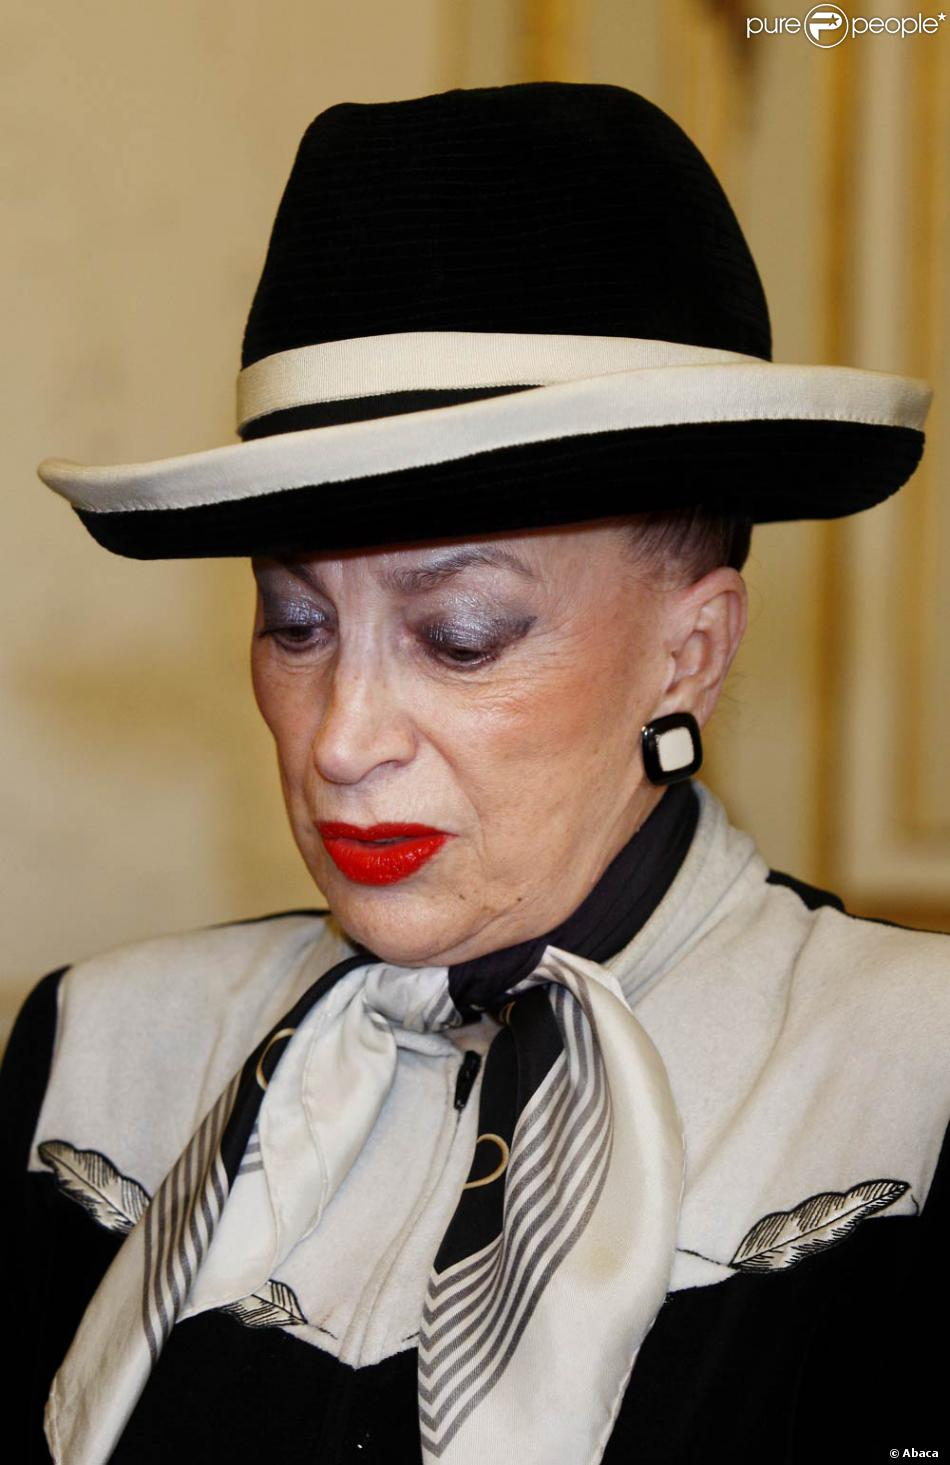 nouveau scandale miss france genevi ve de fontenay va t elle en manger son chapeau. Black Bedroom Furniture Sets. Home Design Ideas